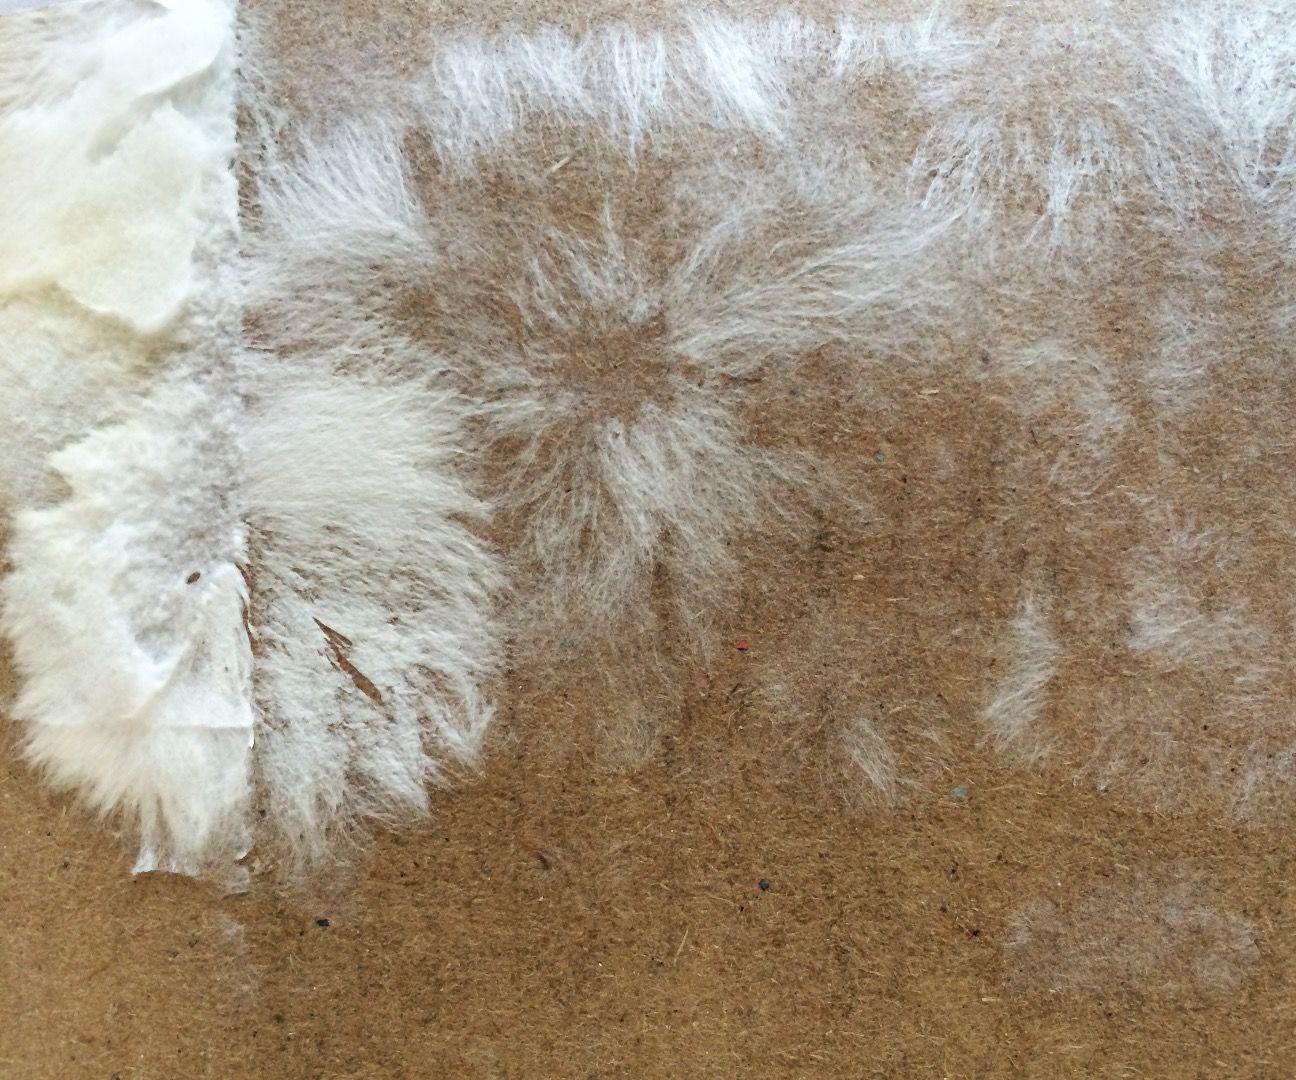 Making Mycelium